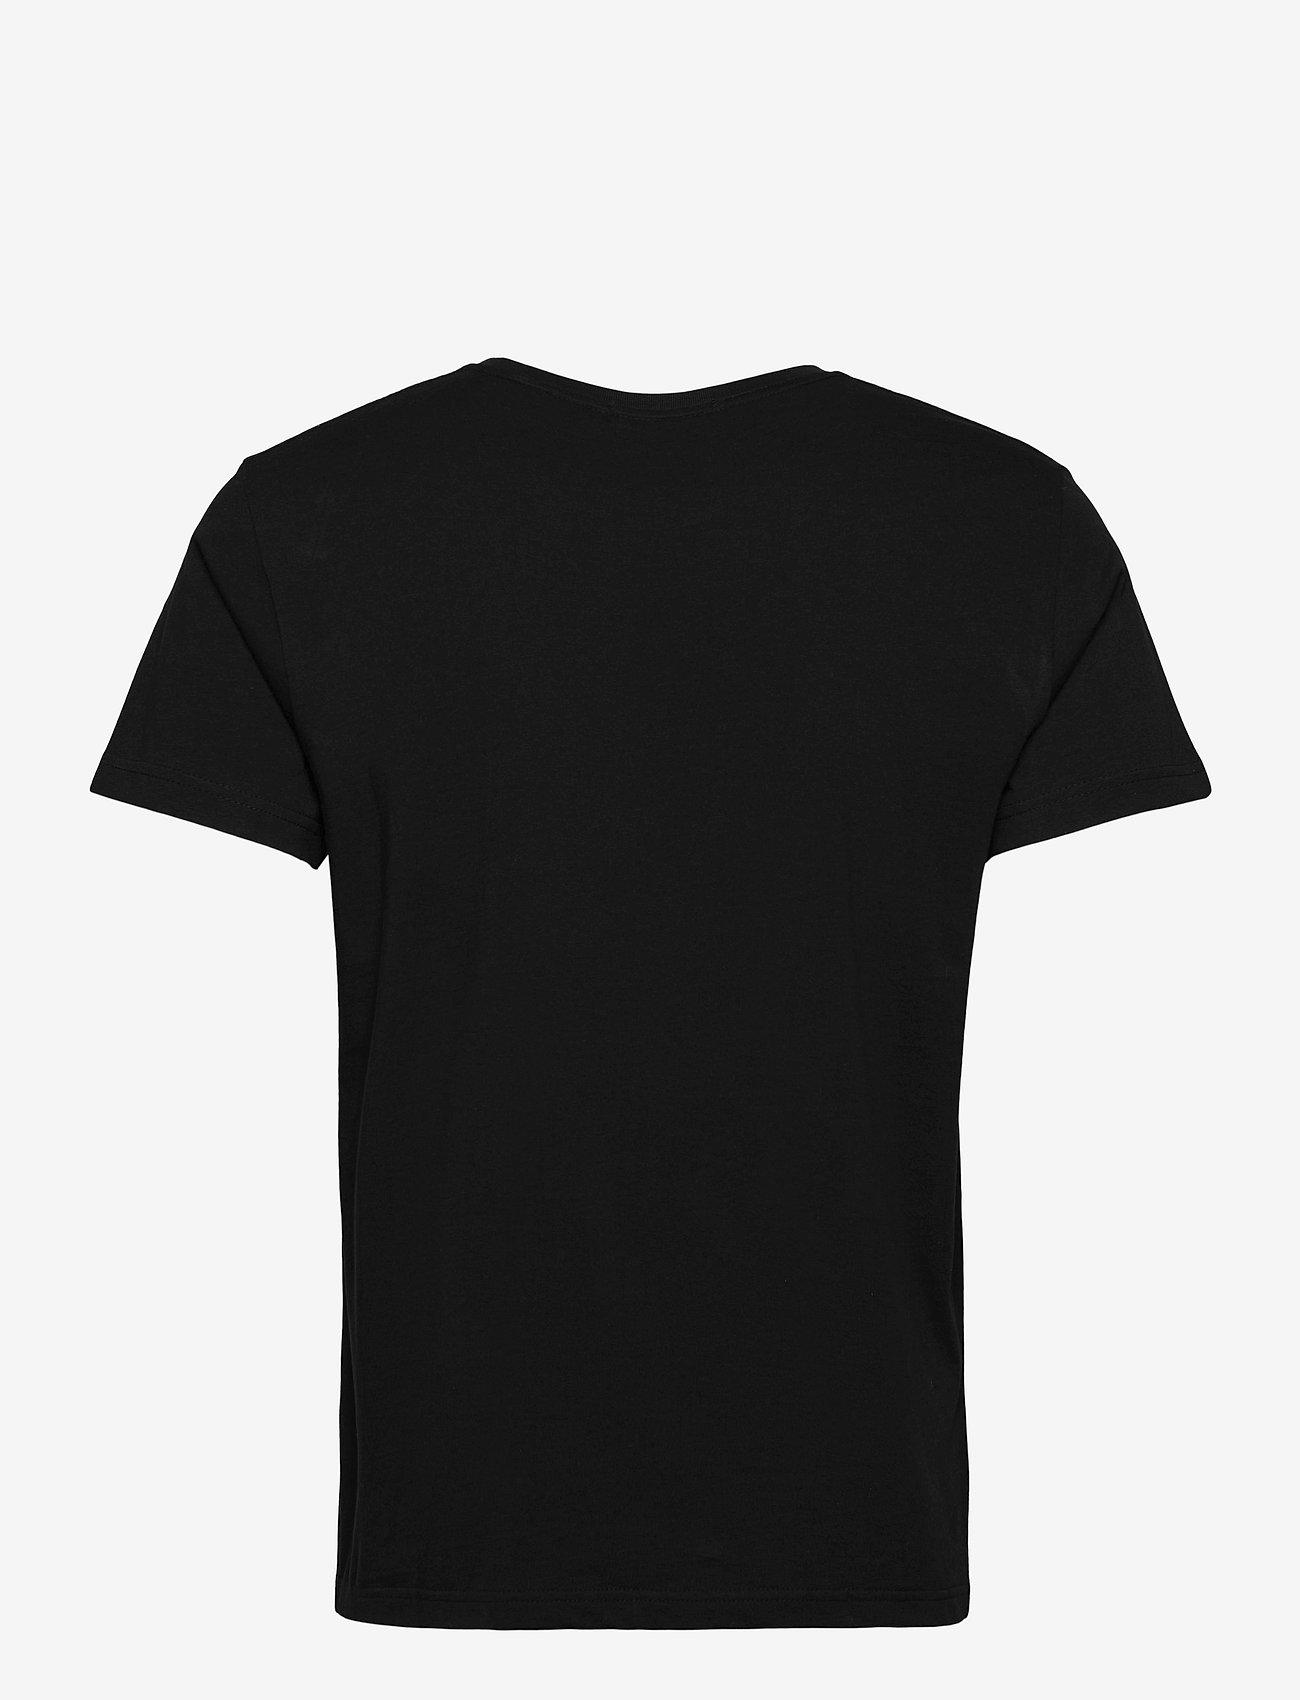 GANT - ORIGINAL SS T-SHIRT - short-sleeved t-shirts - black - 1